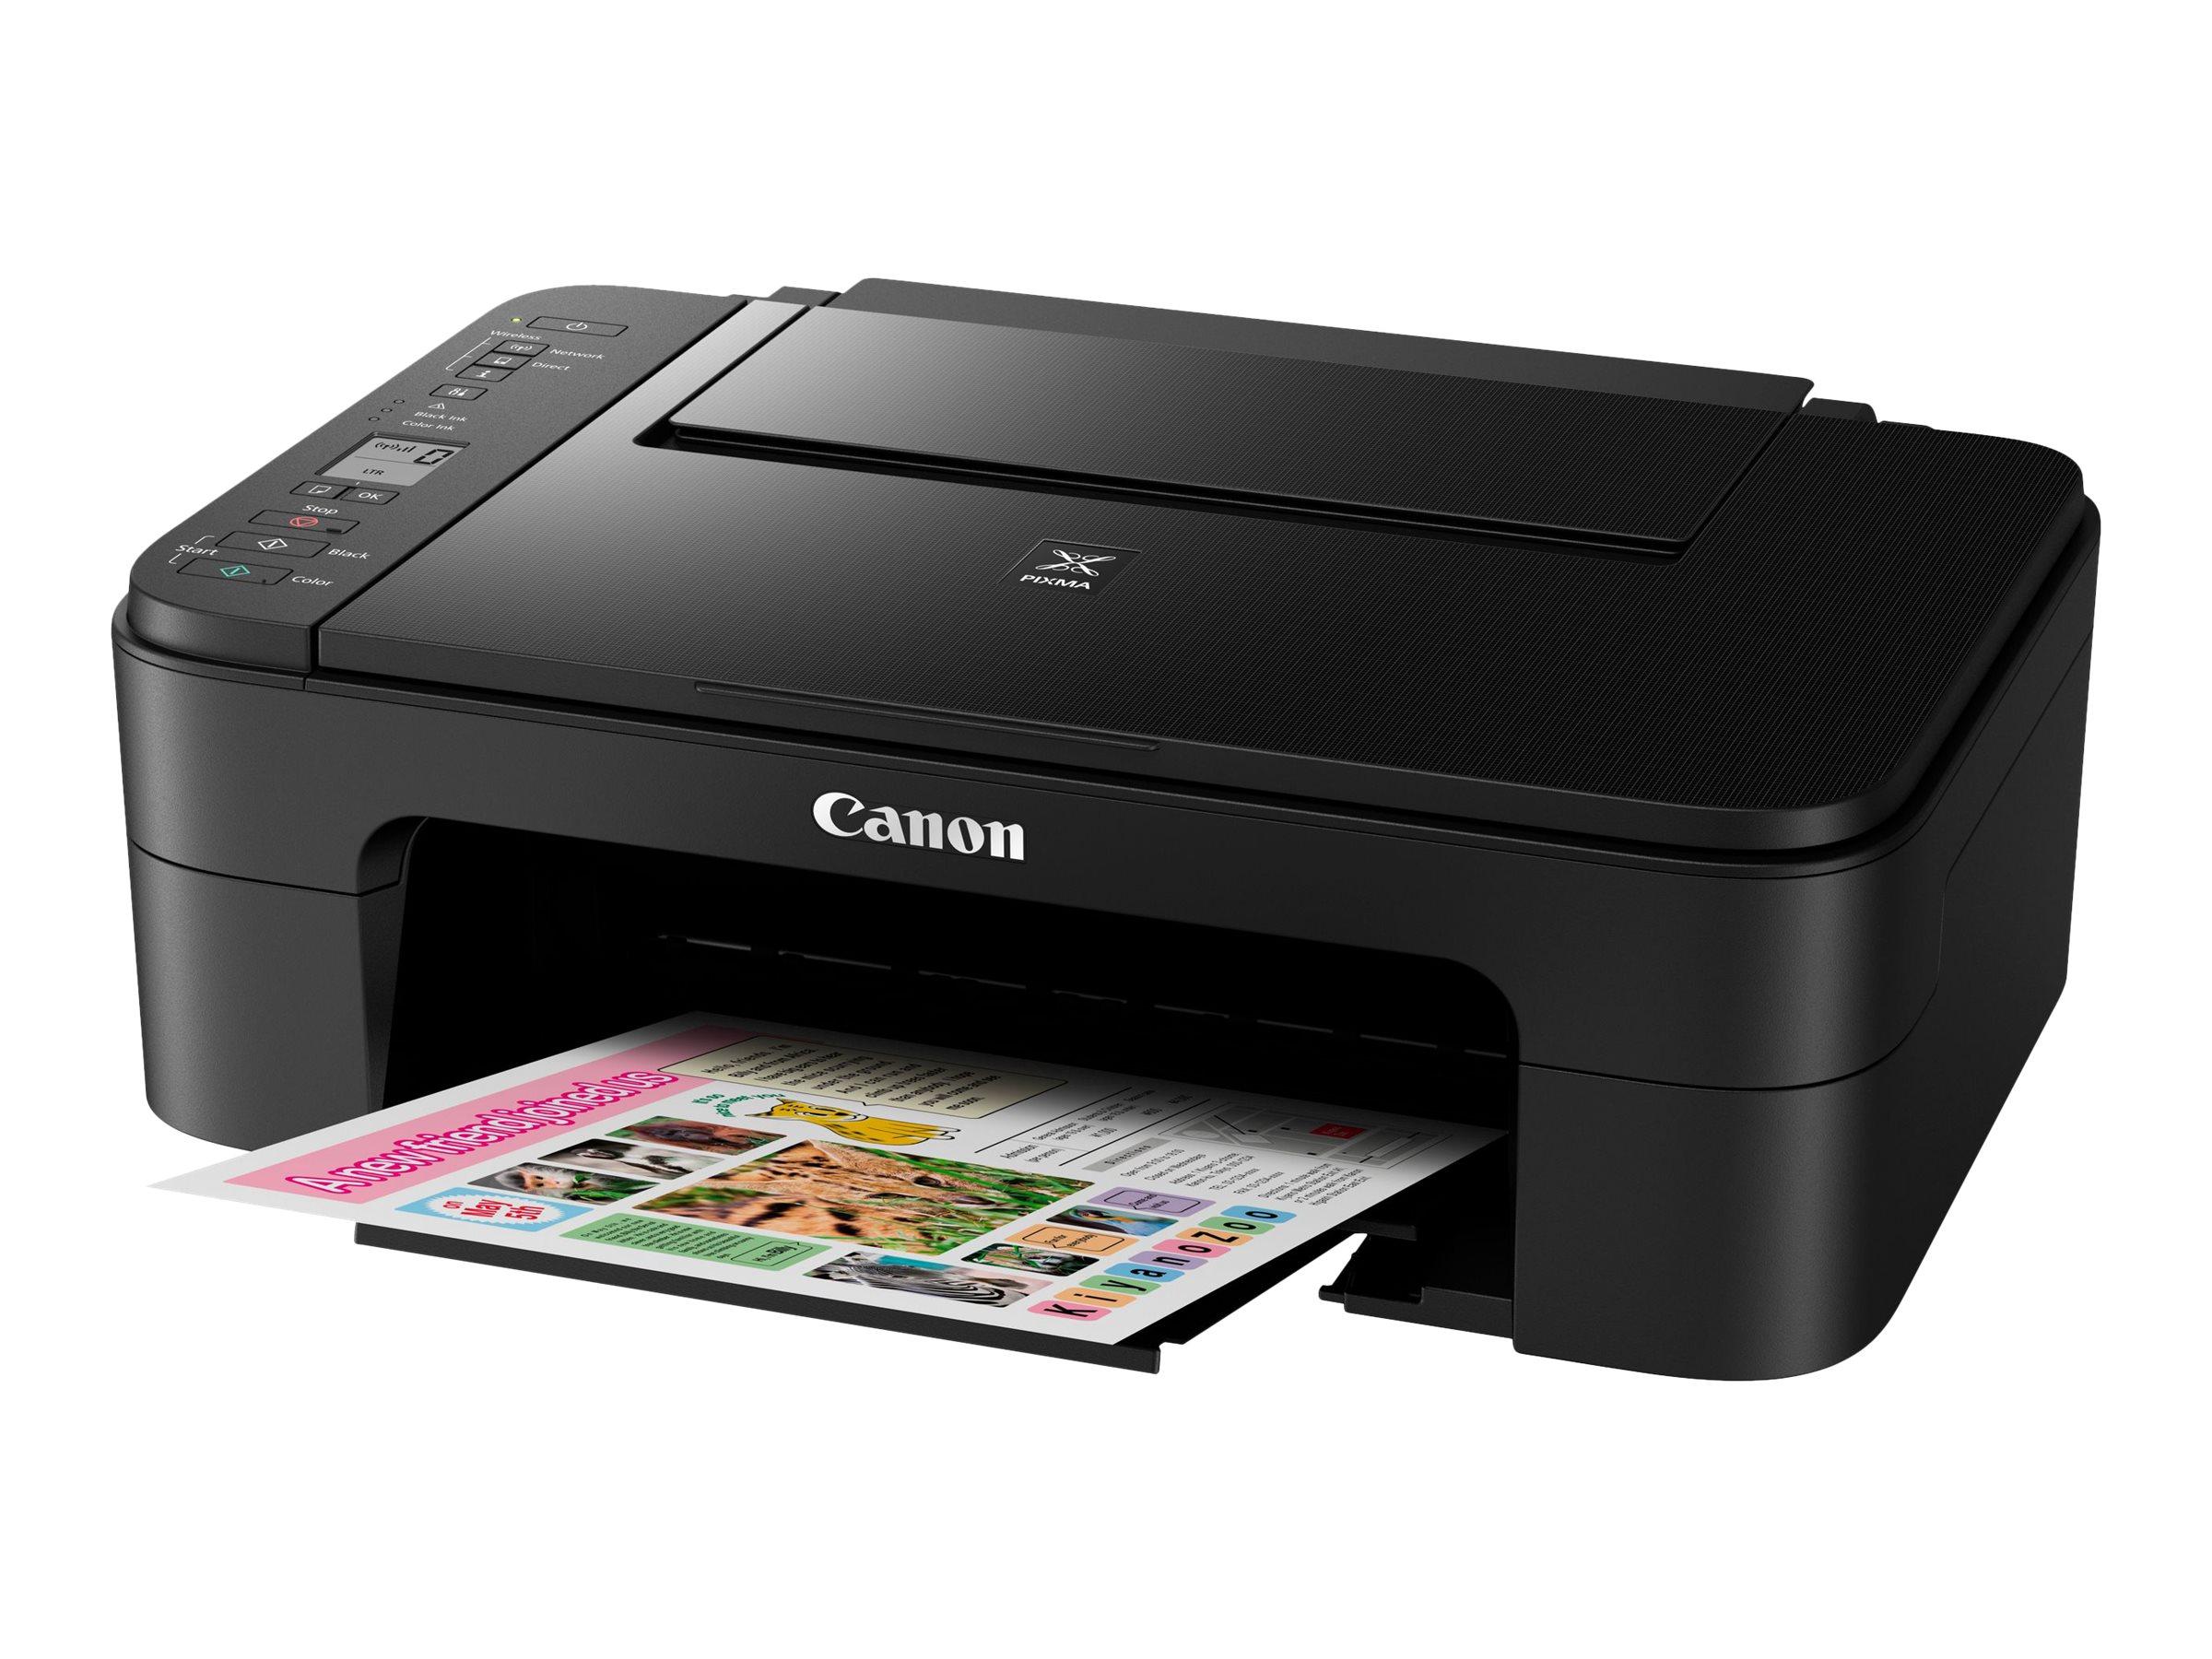 Canon PIXMA TS3150 - Multifunktionsdrucker - Farbe - Tintenstrahl - 216 x 297 mm (Original)